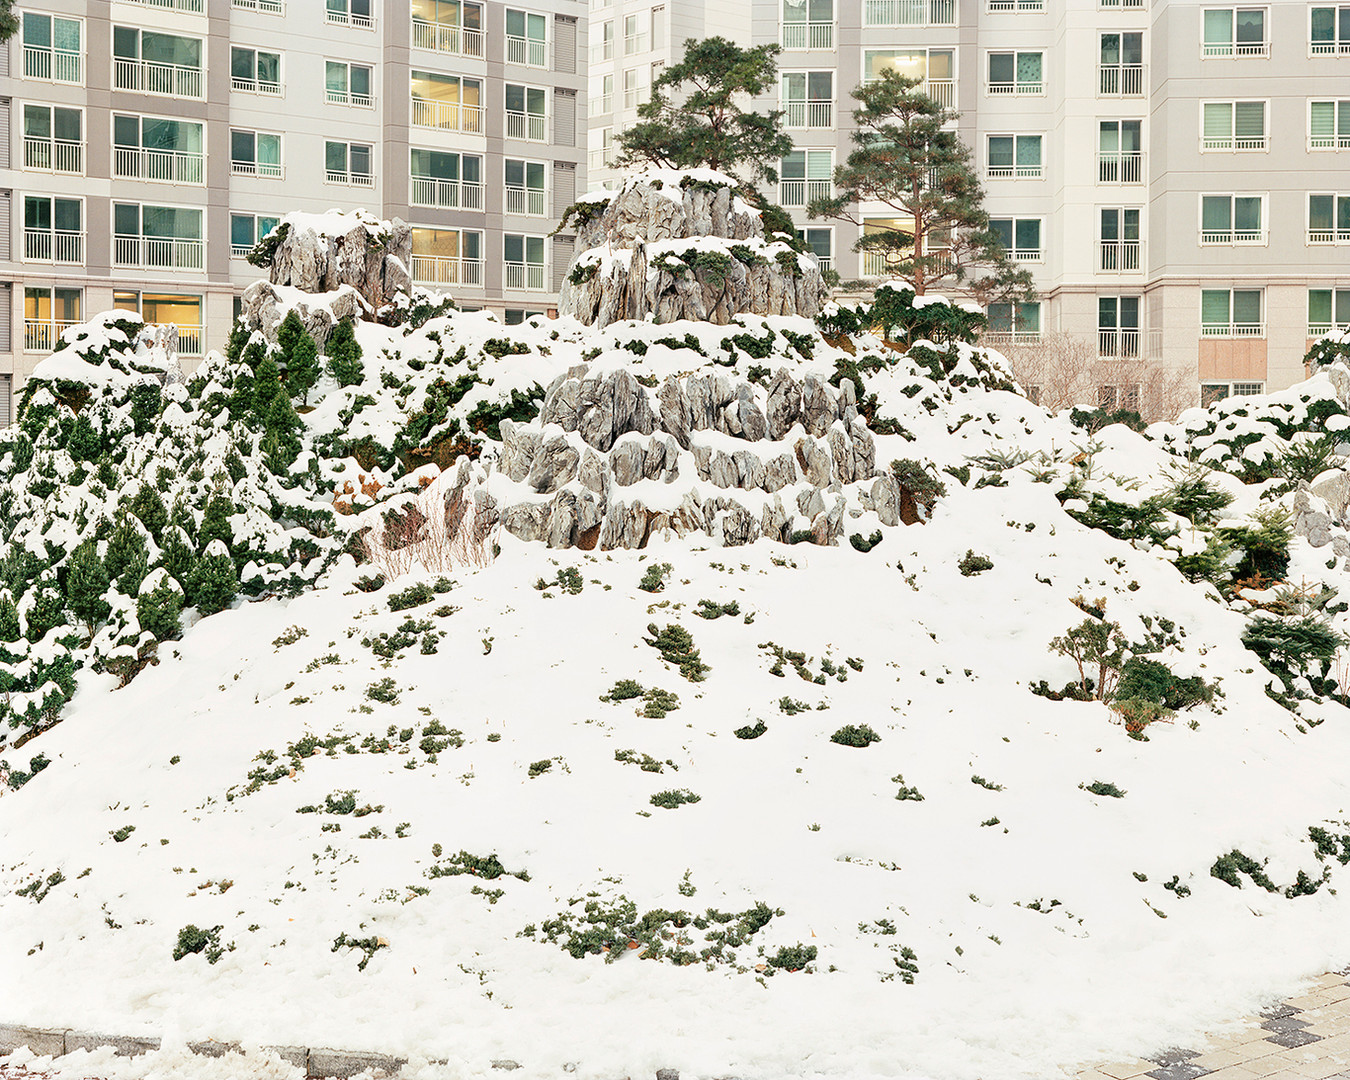 Mt. Hwaak 2, Seoul, December 2012